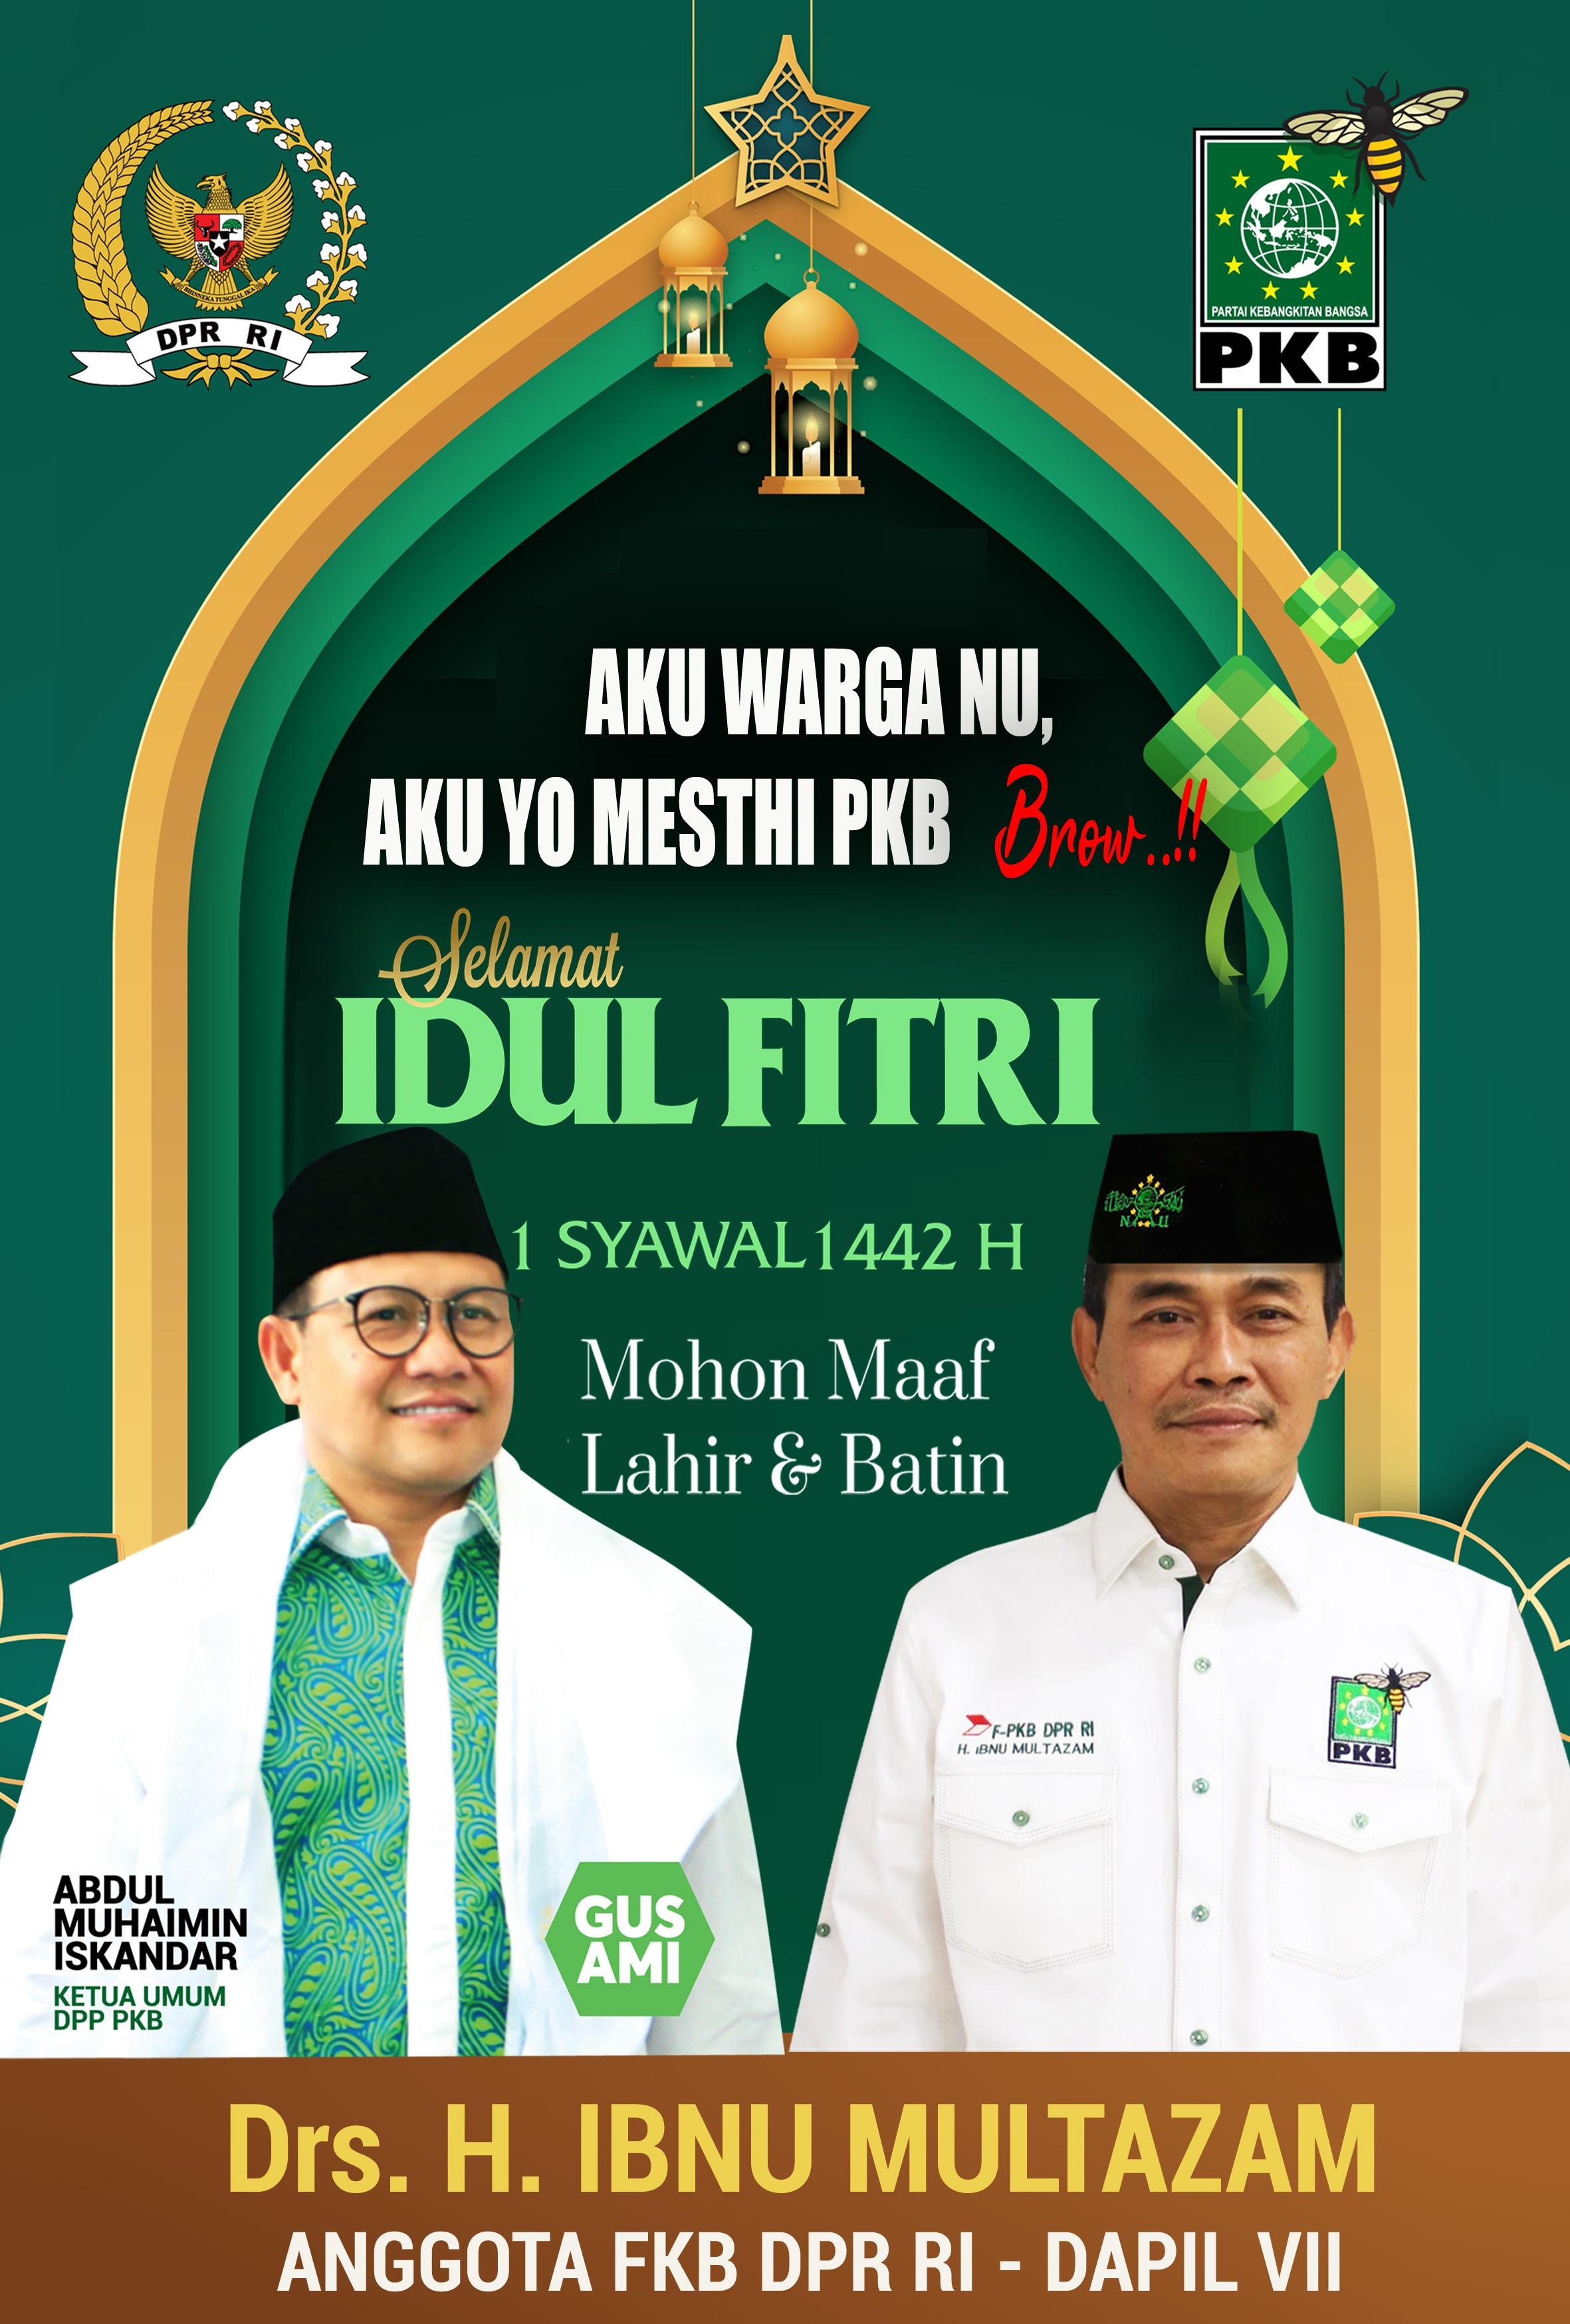 Anggota Fraksi PKB DPR RI, Drs H Ibnu Multazam Mengucapkan Selamat Hari Raya Idul Fitri 1442 Hijriyah Mohon Maaf Lahir dan Batin